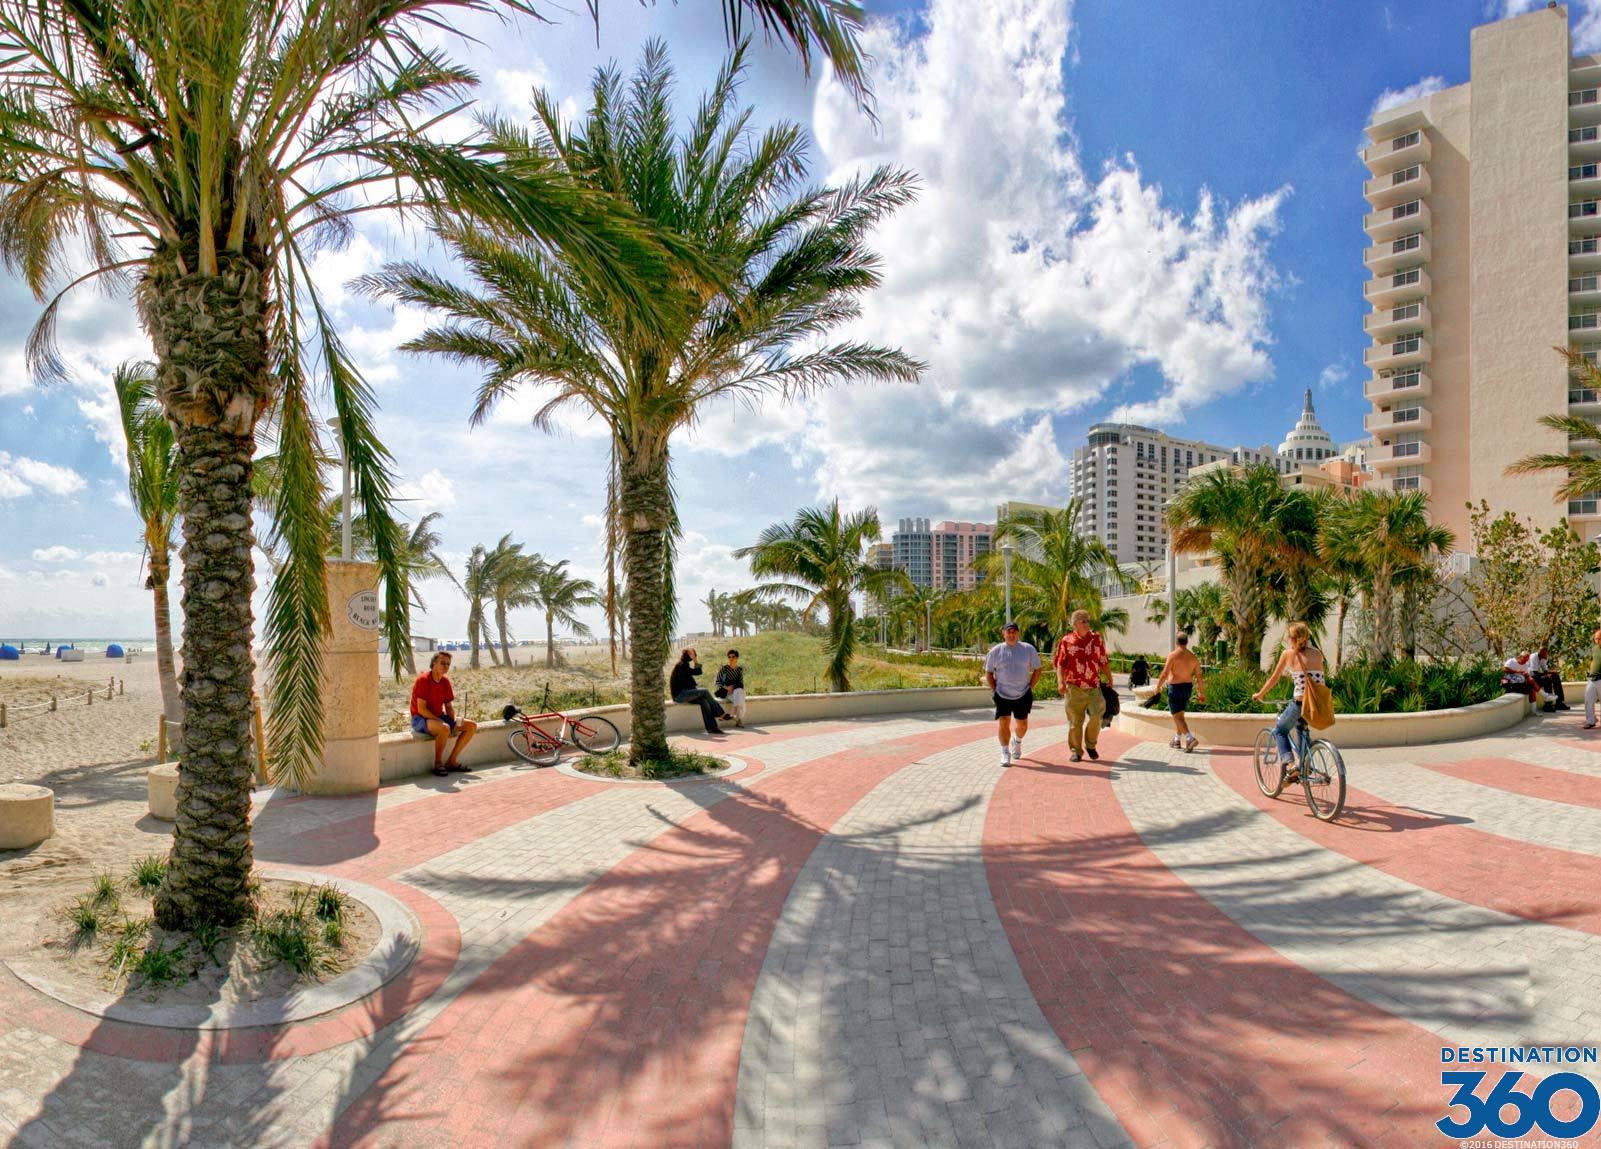 South Beach, Miami Beach Florida, South Beach Miami, Miami Beach